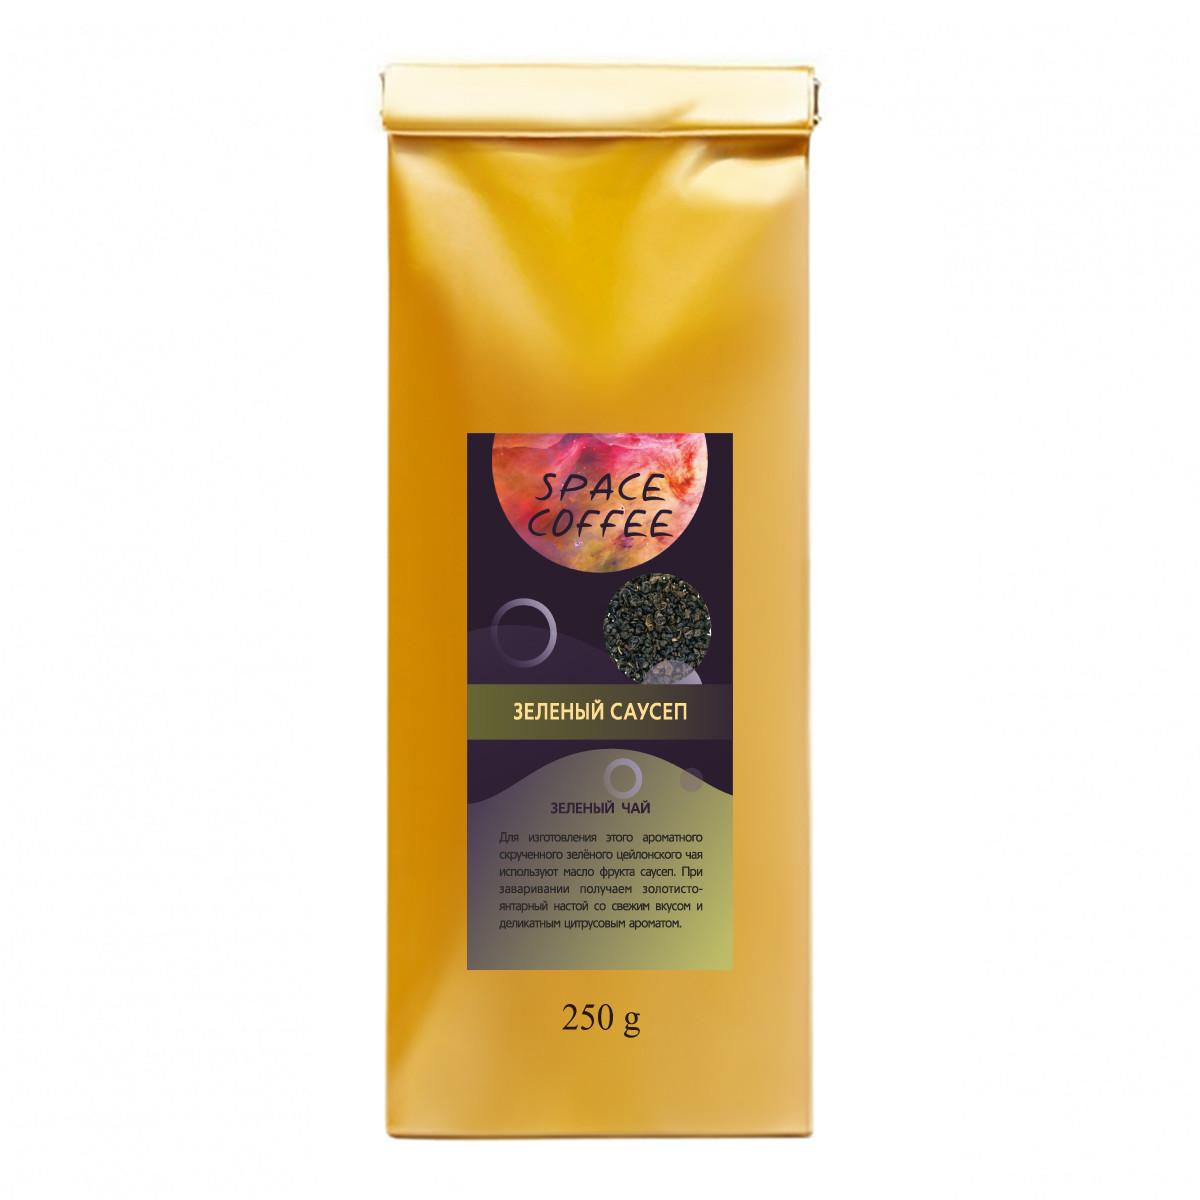 Чай с саусепом Space Coffee зеленый цейлонский 250 грамм